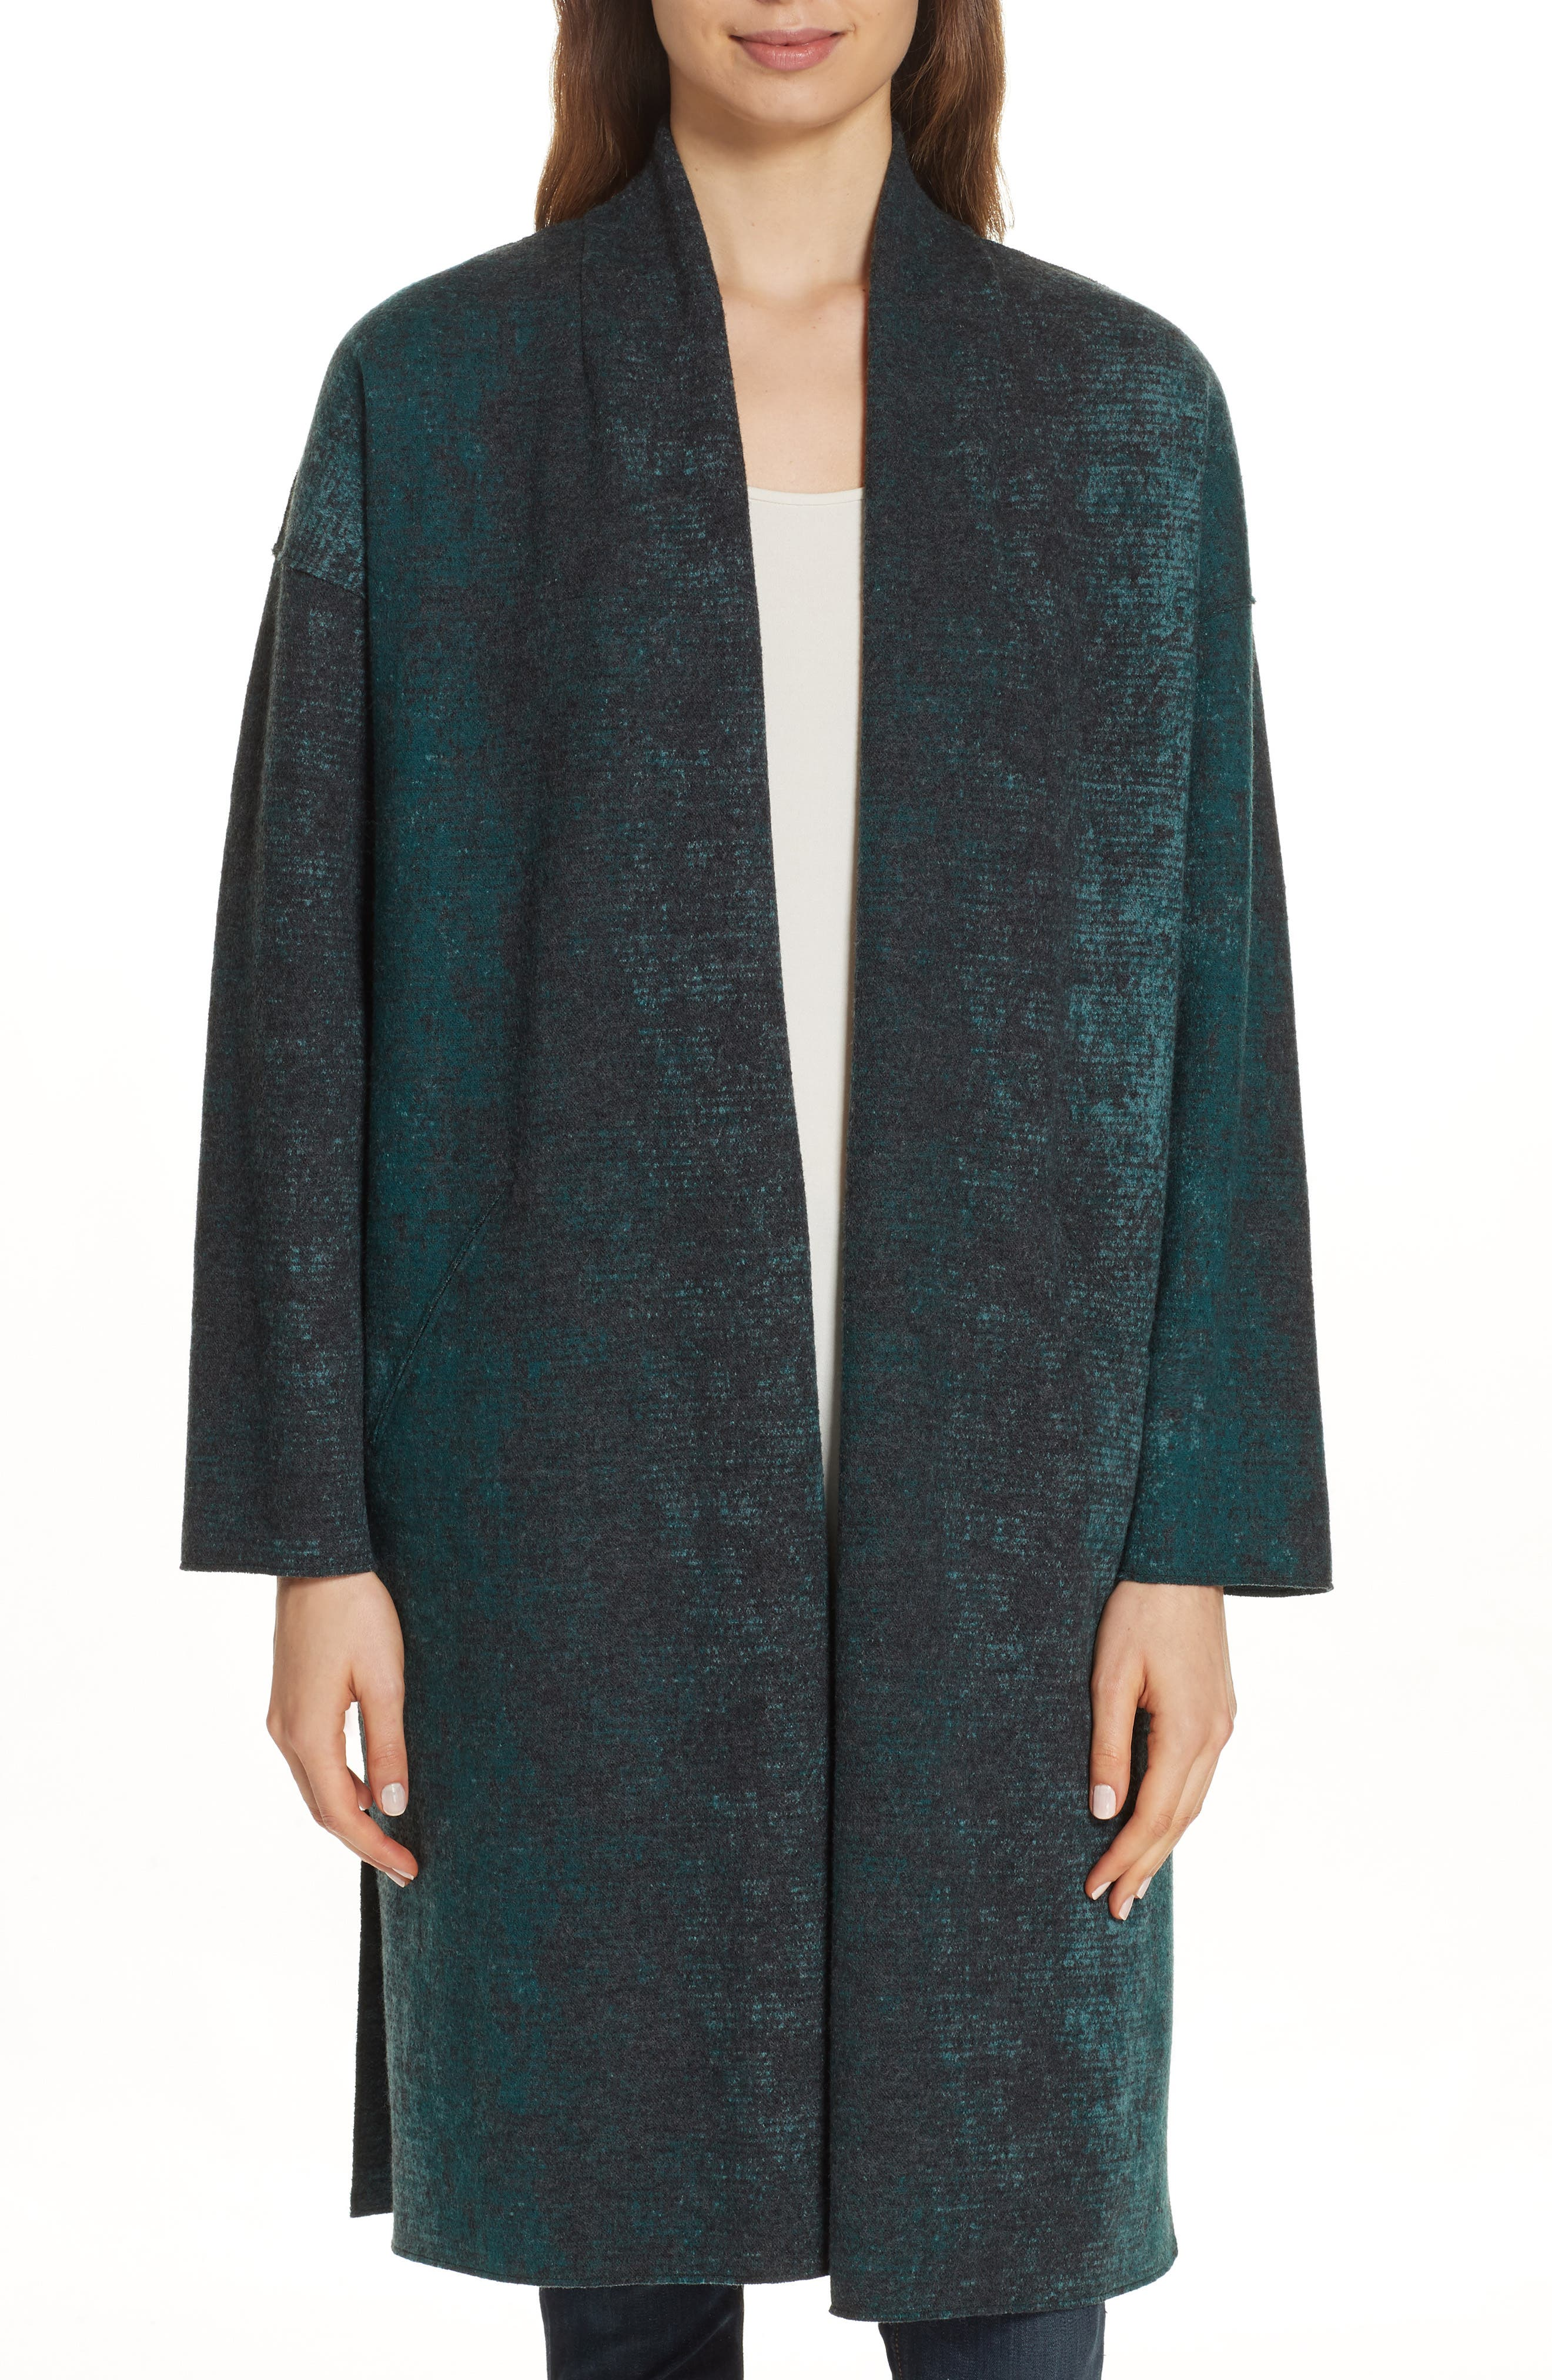 EILEEN FISHER, Wool Blend Kimono Coat, Main thumbnail 1, color, PINE